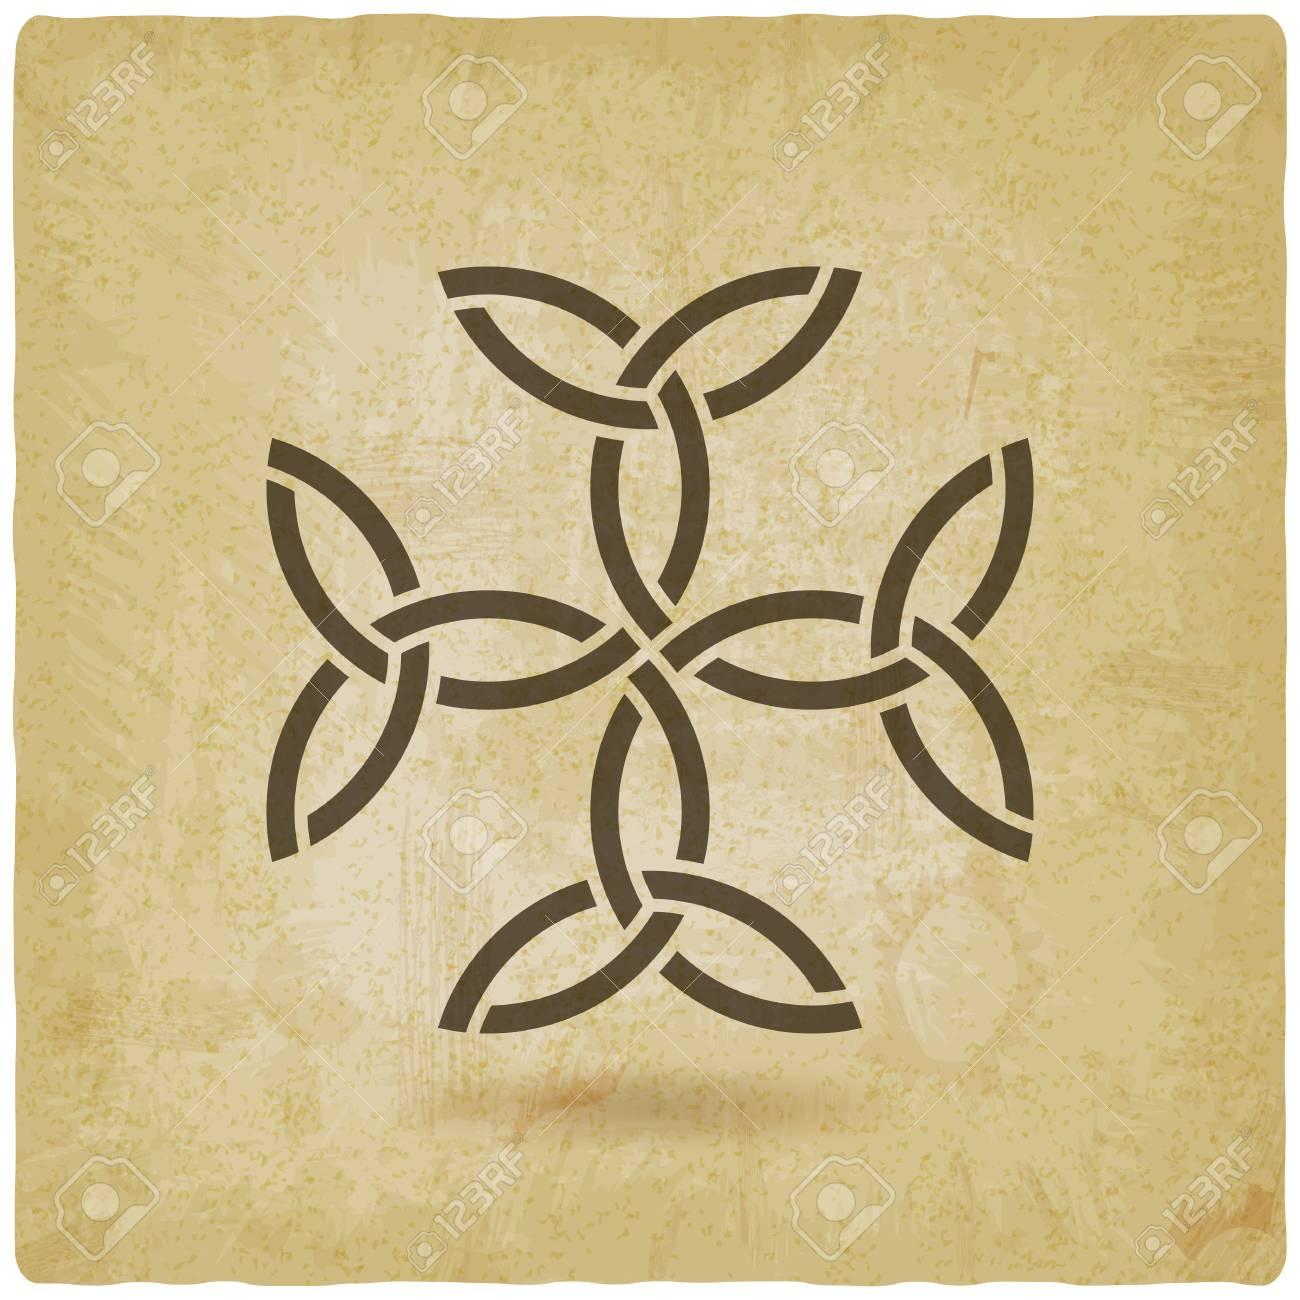 Carolingian Cross Trinity Knots Celtic Symbol Vintage Background